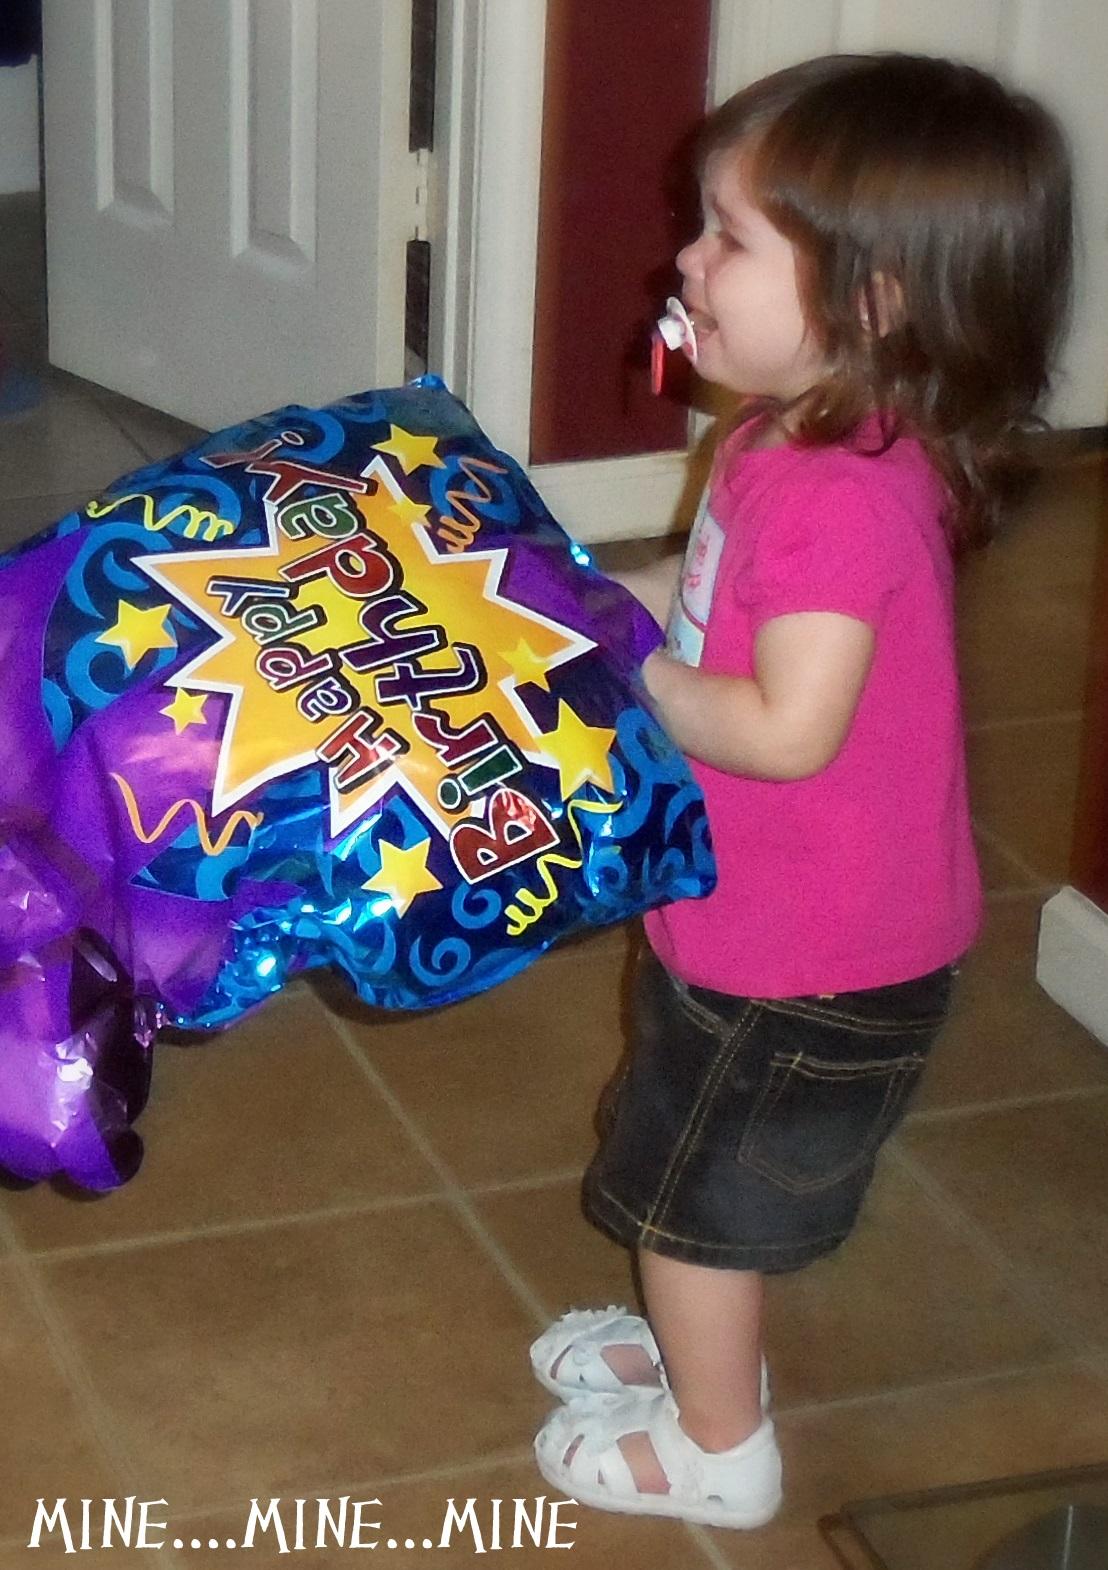 http://1.bp.blogspot.com/-MeVpHnvjYyc/Tf6iC9_UCuI/AAAAAAAAC2E/WMrrYItzHzk/s1600/fathers+daylillys+birthday+045.JPG